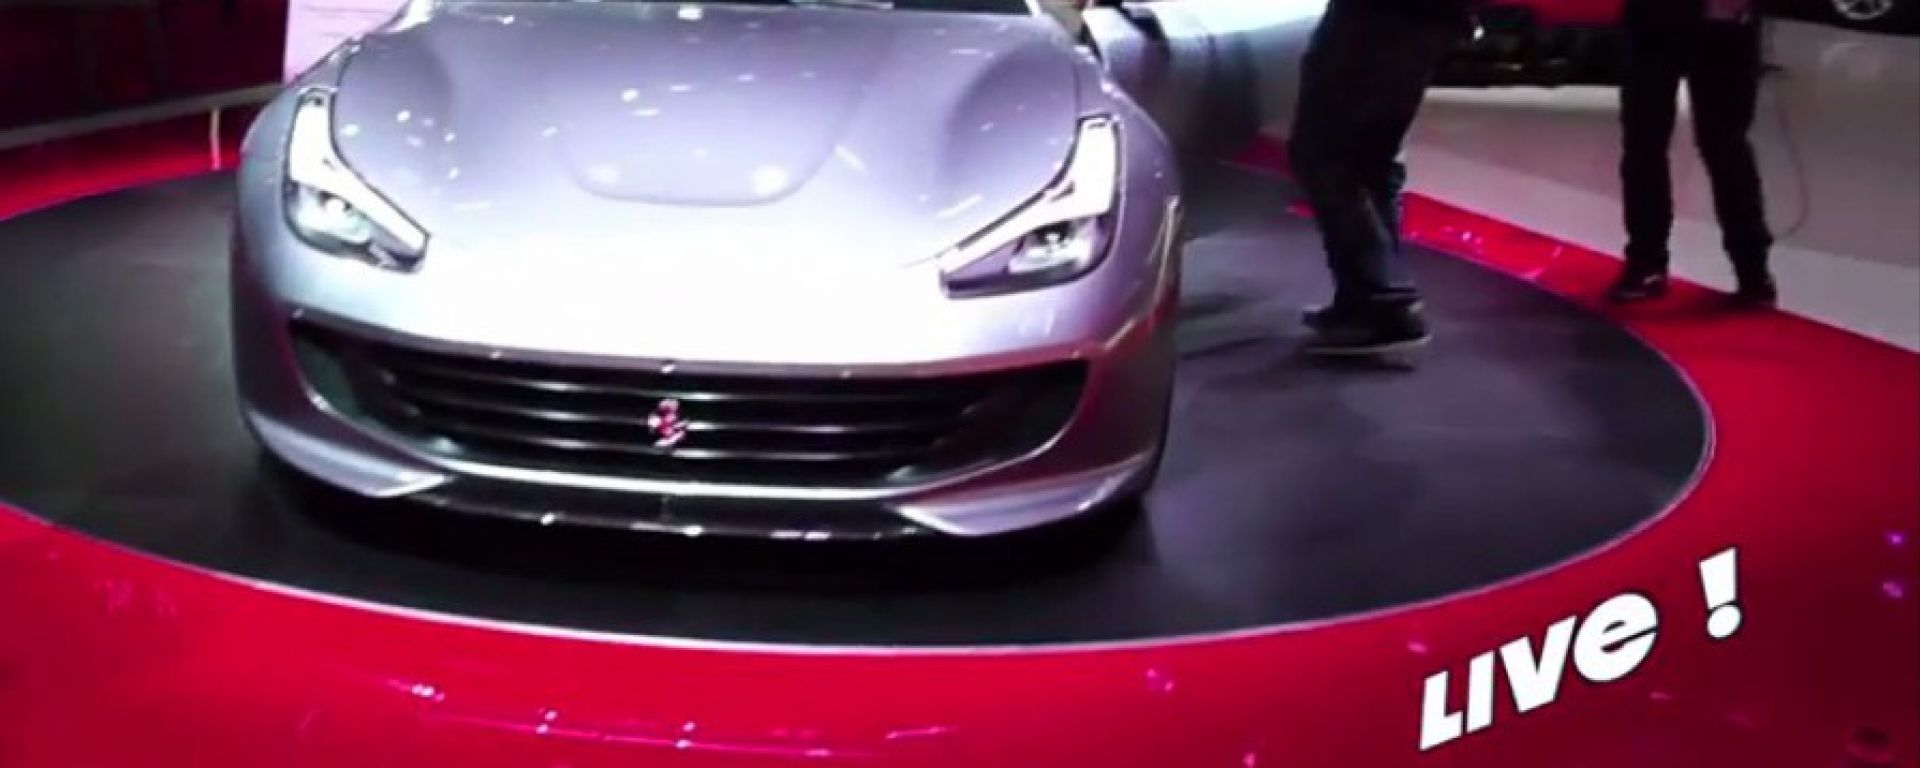 Live Parigi 2016: Ferrari LaFerrari Aperta e GTC4Lusso T in video